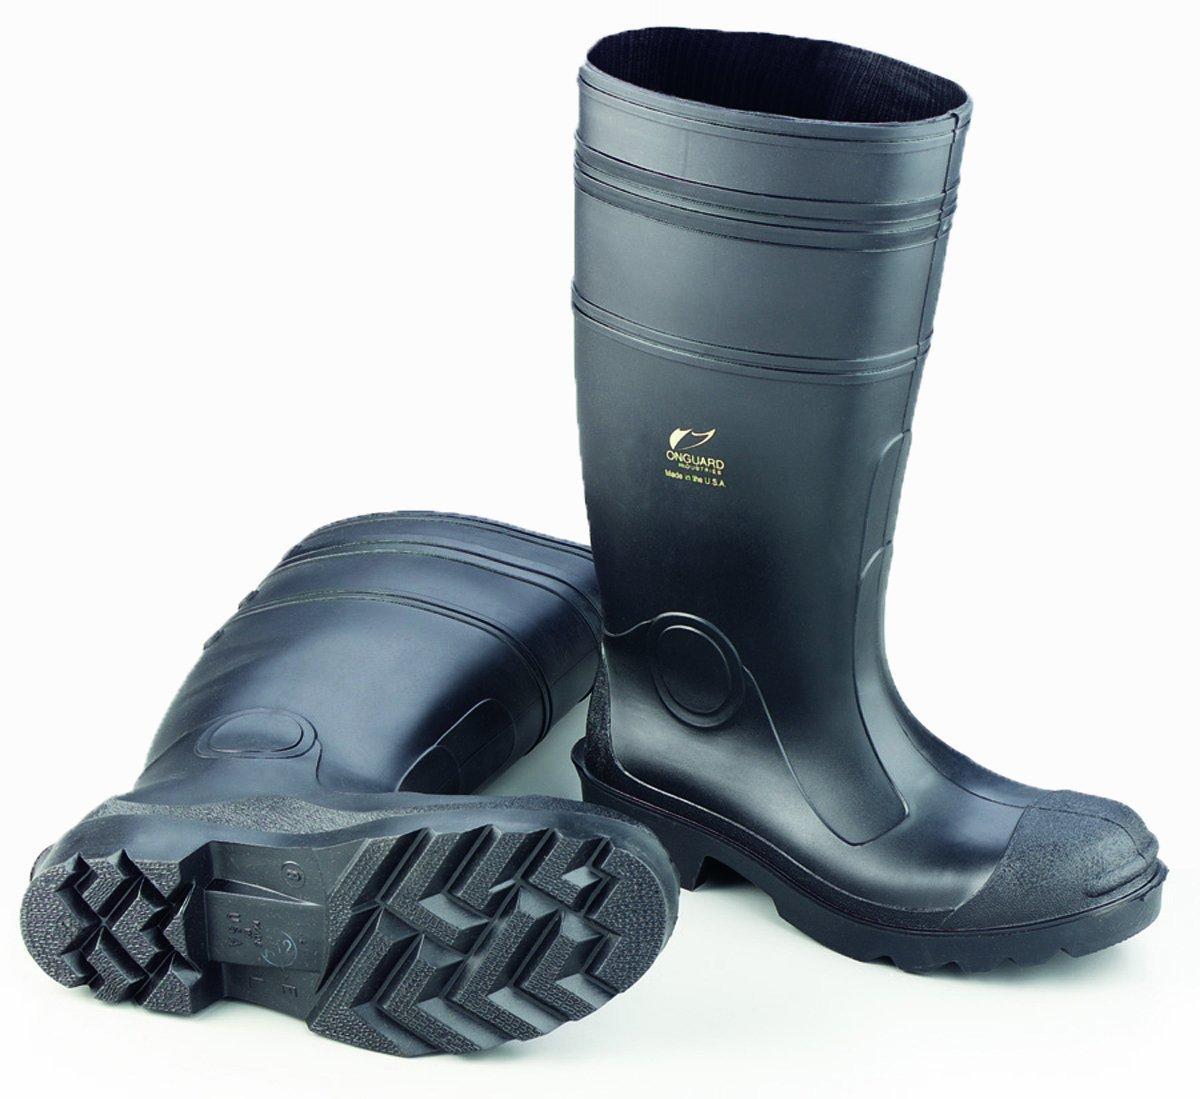 ONGUARD 87401 PVC Men's Buffalo Plain Toe Knee Boots with Lug Outsole, 16'' Height, Black, Size 12